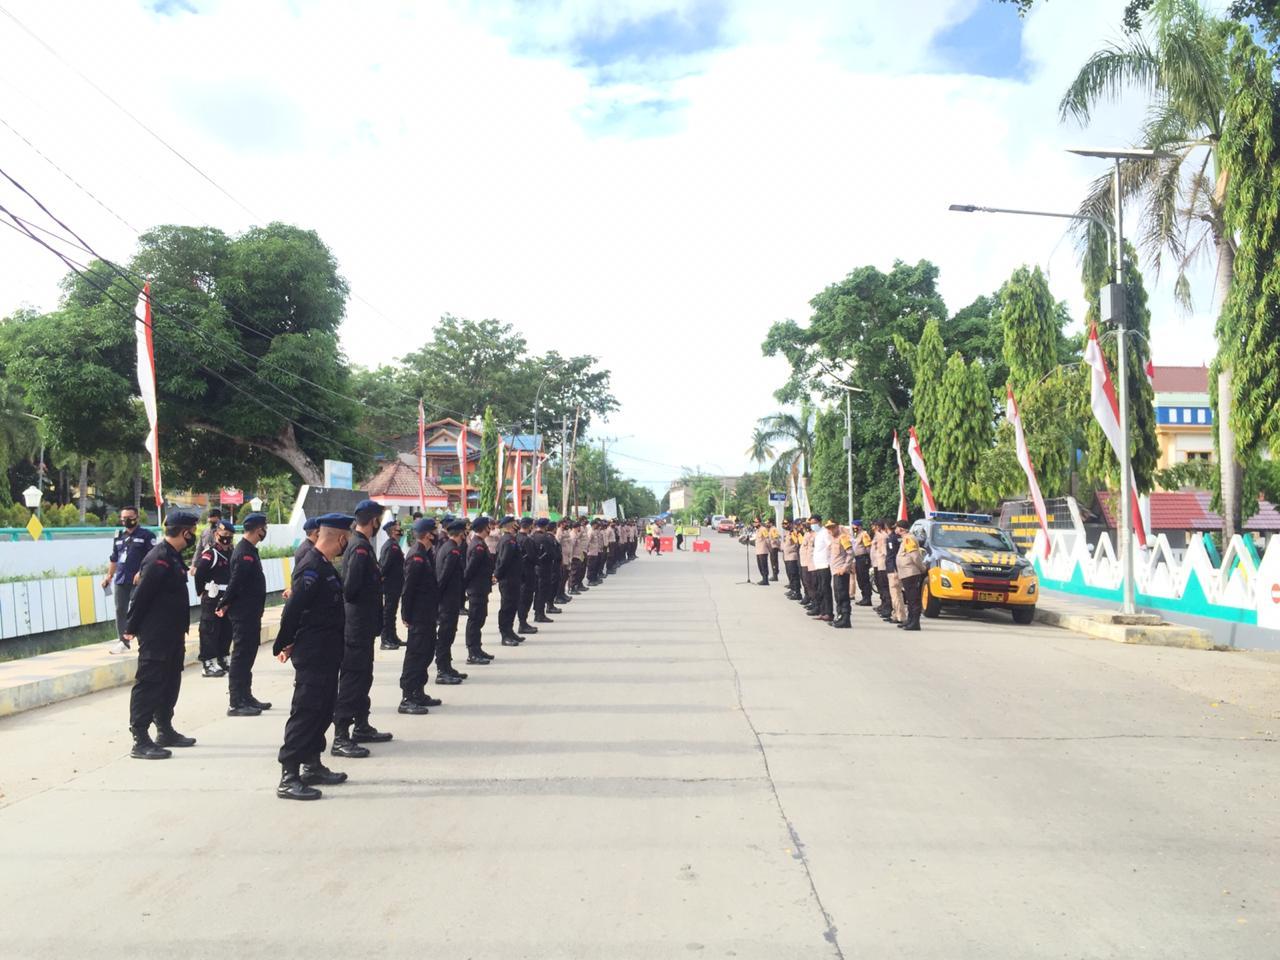 Kapolres Pimpin Apel Gelar Pasukan, Cek Personil Dan Peralatan Dalam Pengamanan Rapat Pleno